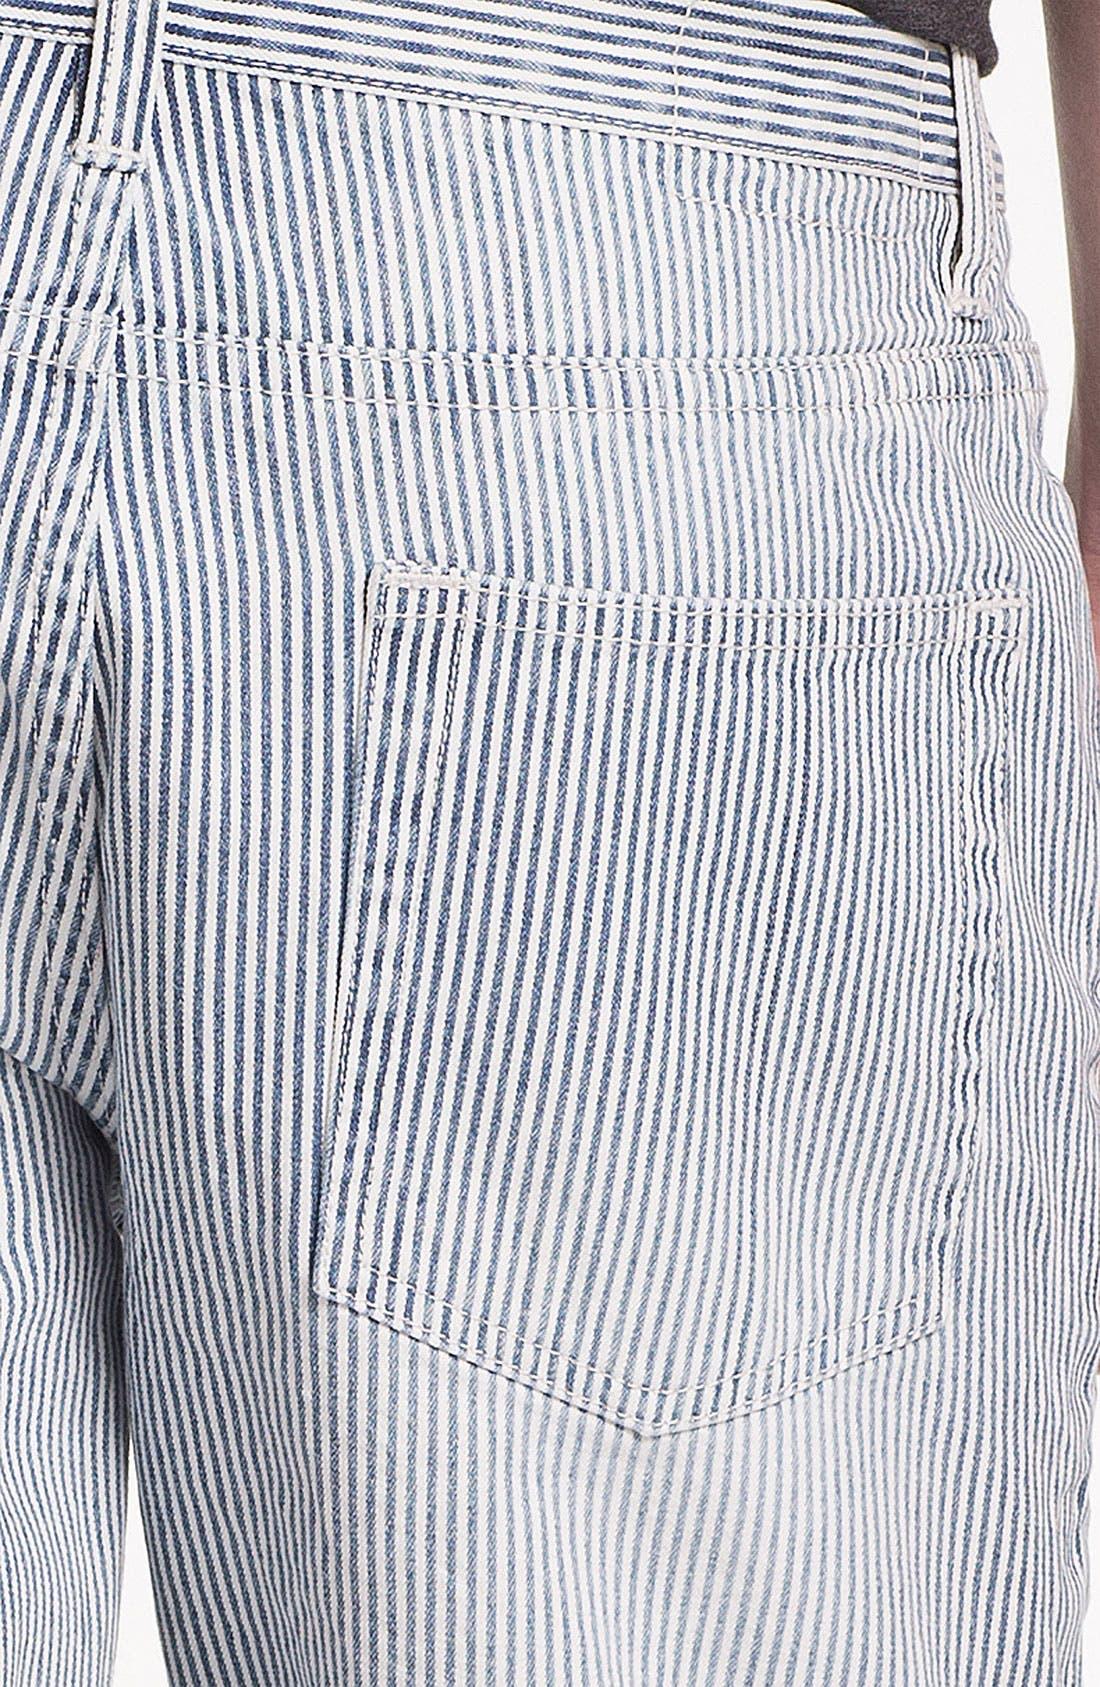 Slim Fit Stripe Denim Shorts,                             Alternate thumbnail 4, color,                             420